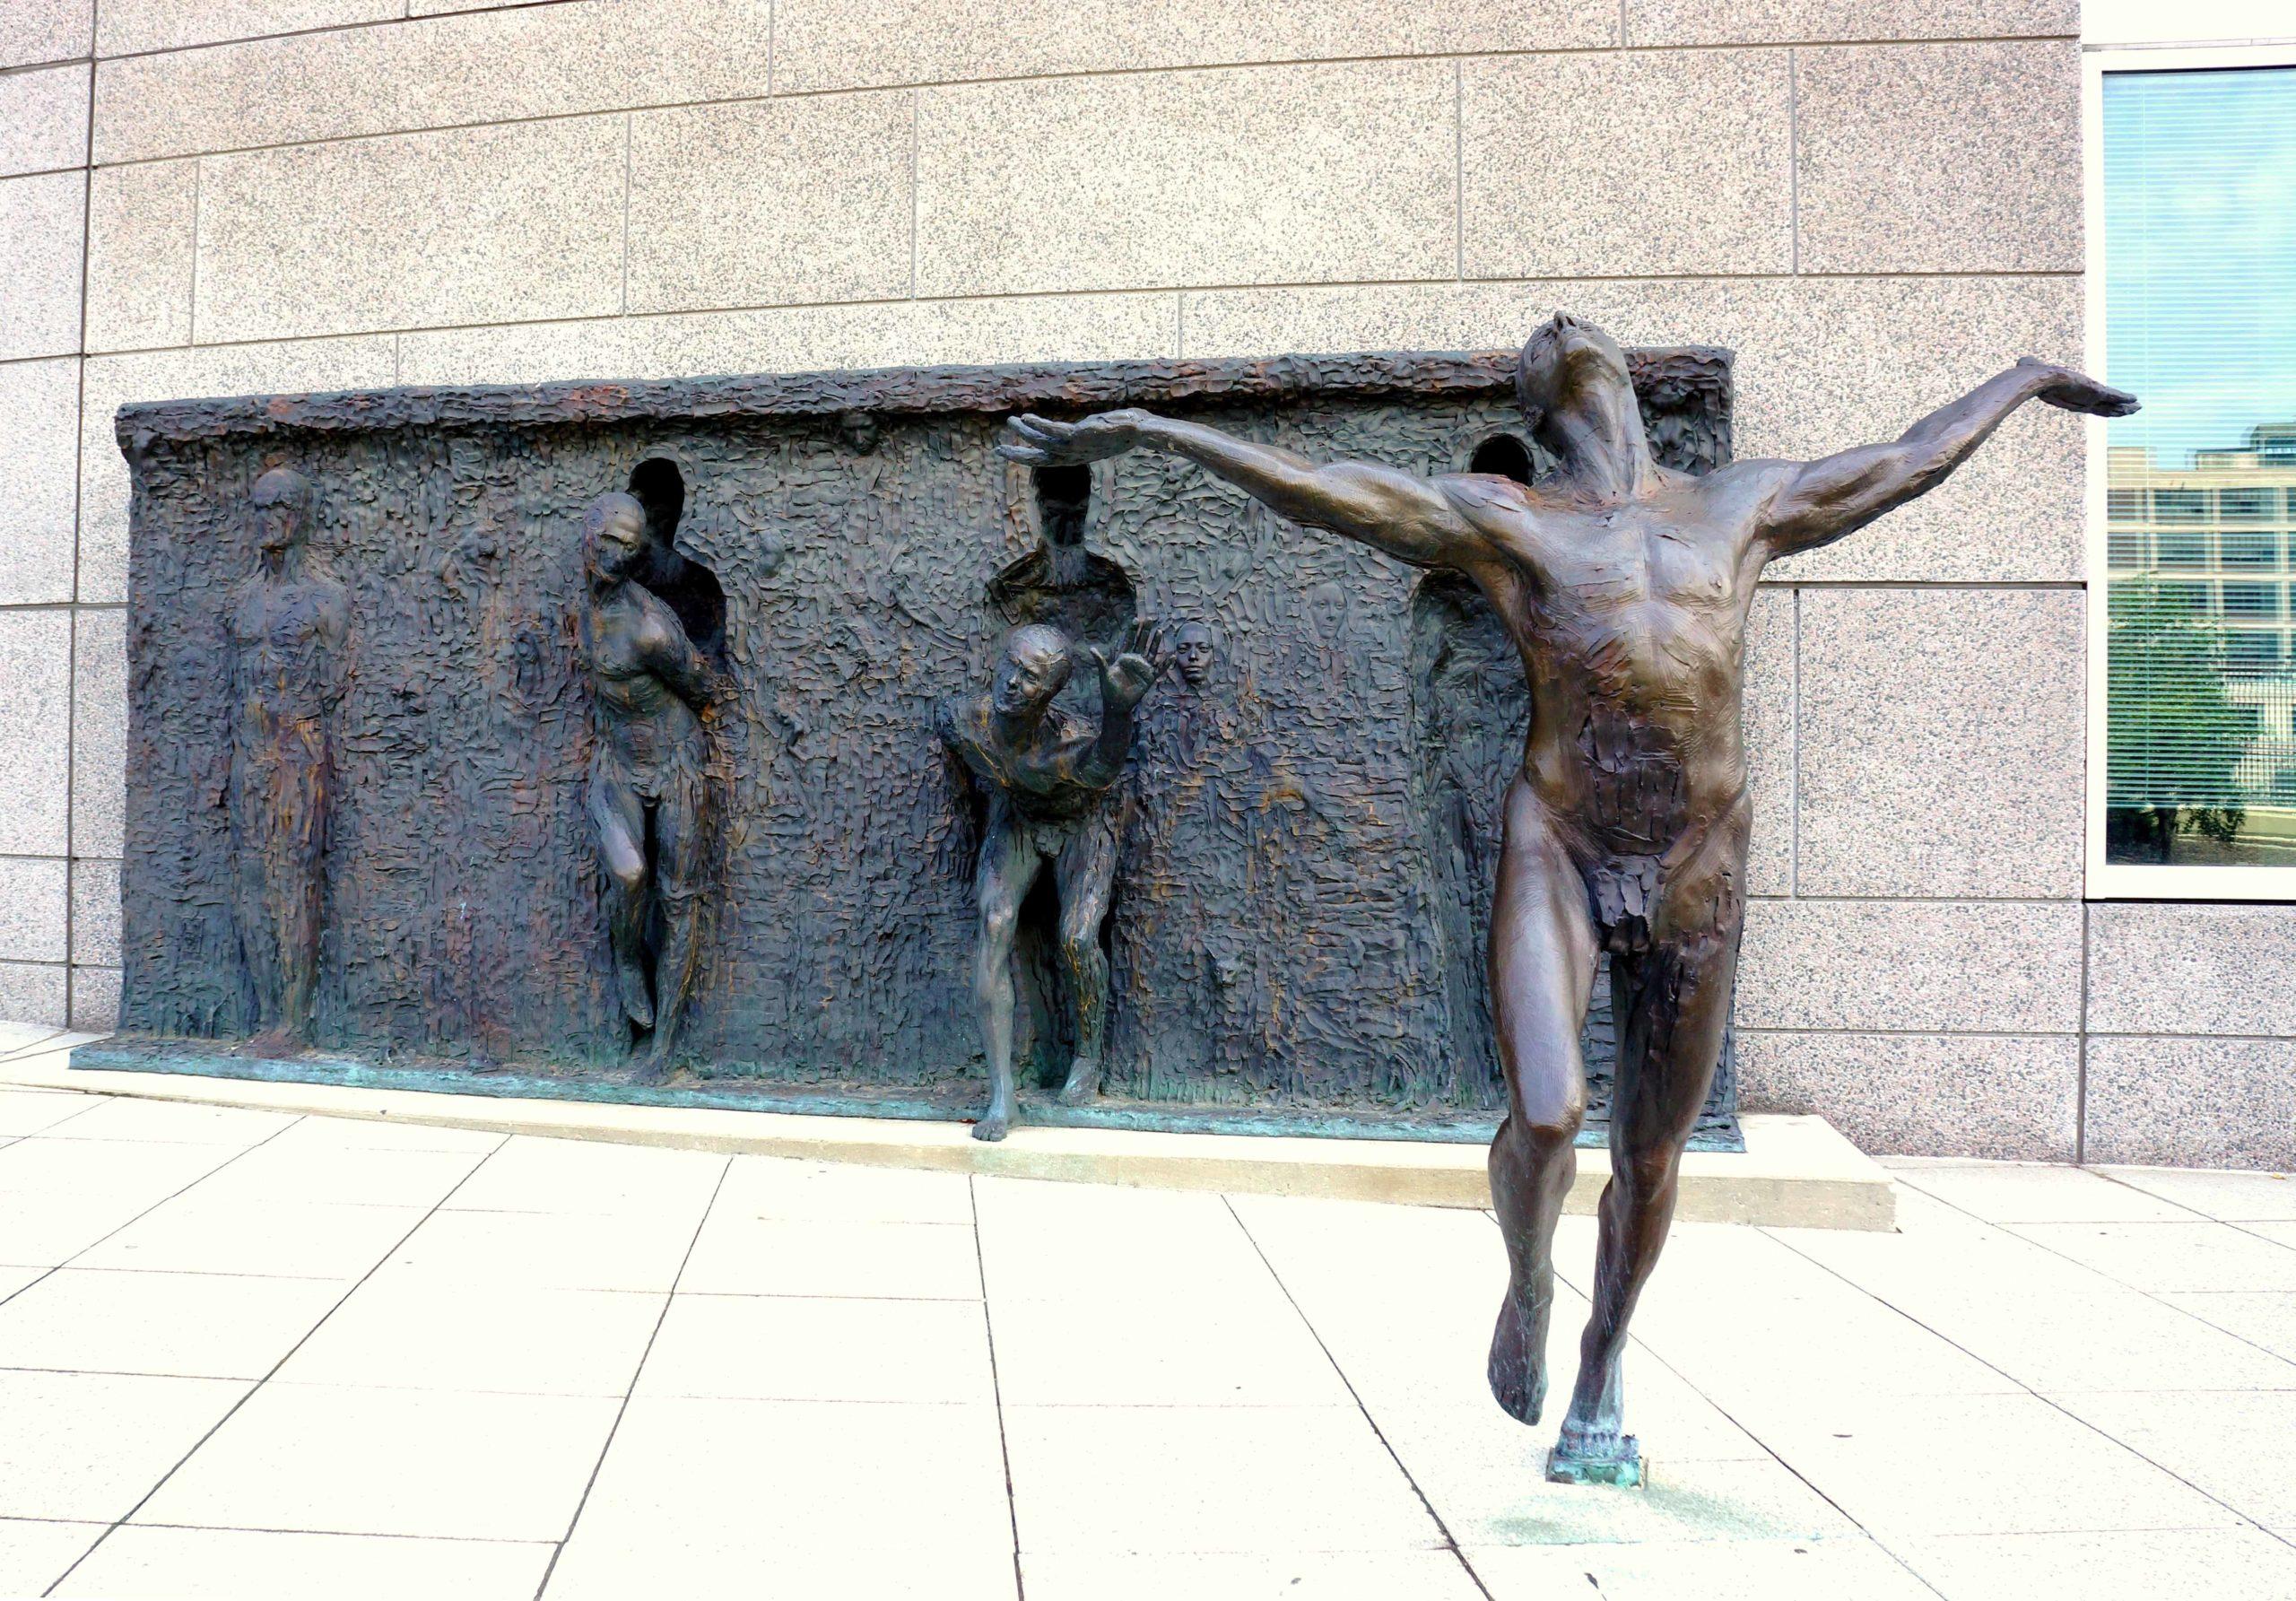 1.Freedom by Zenos Frudakis